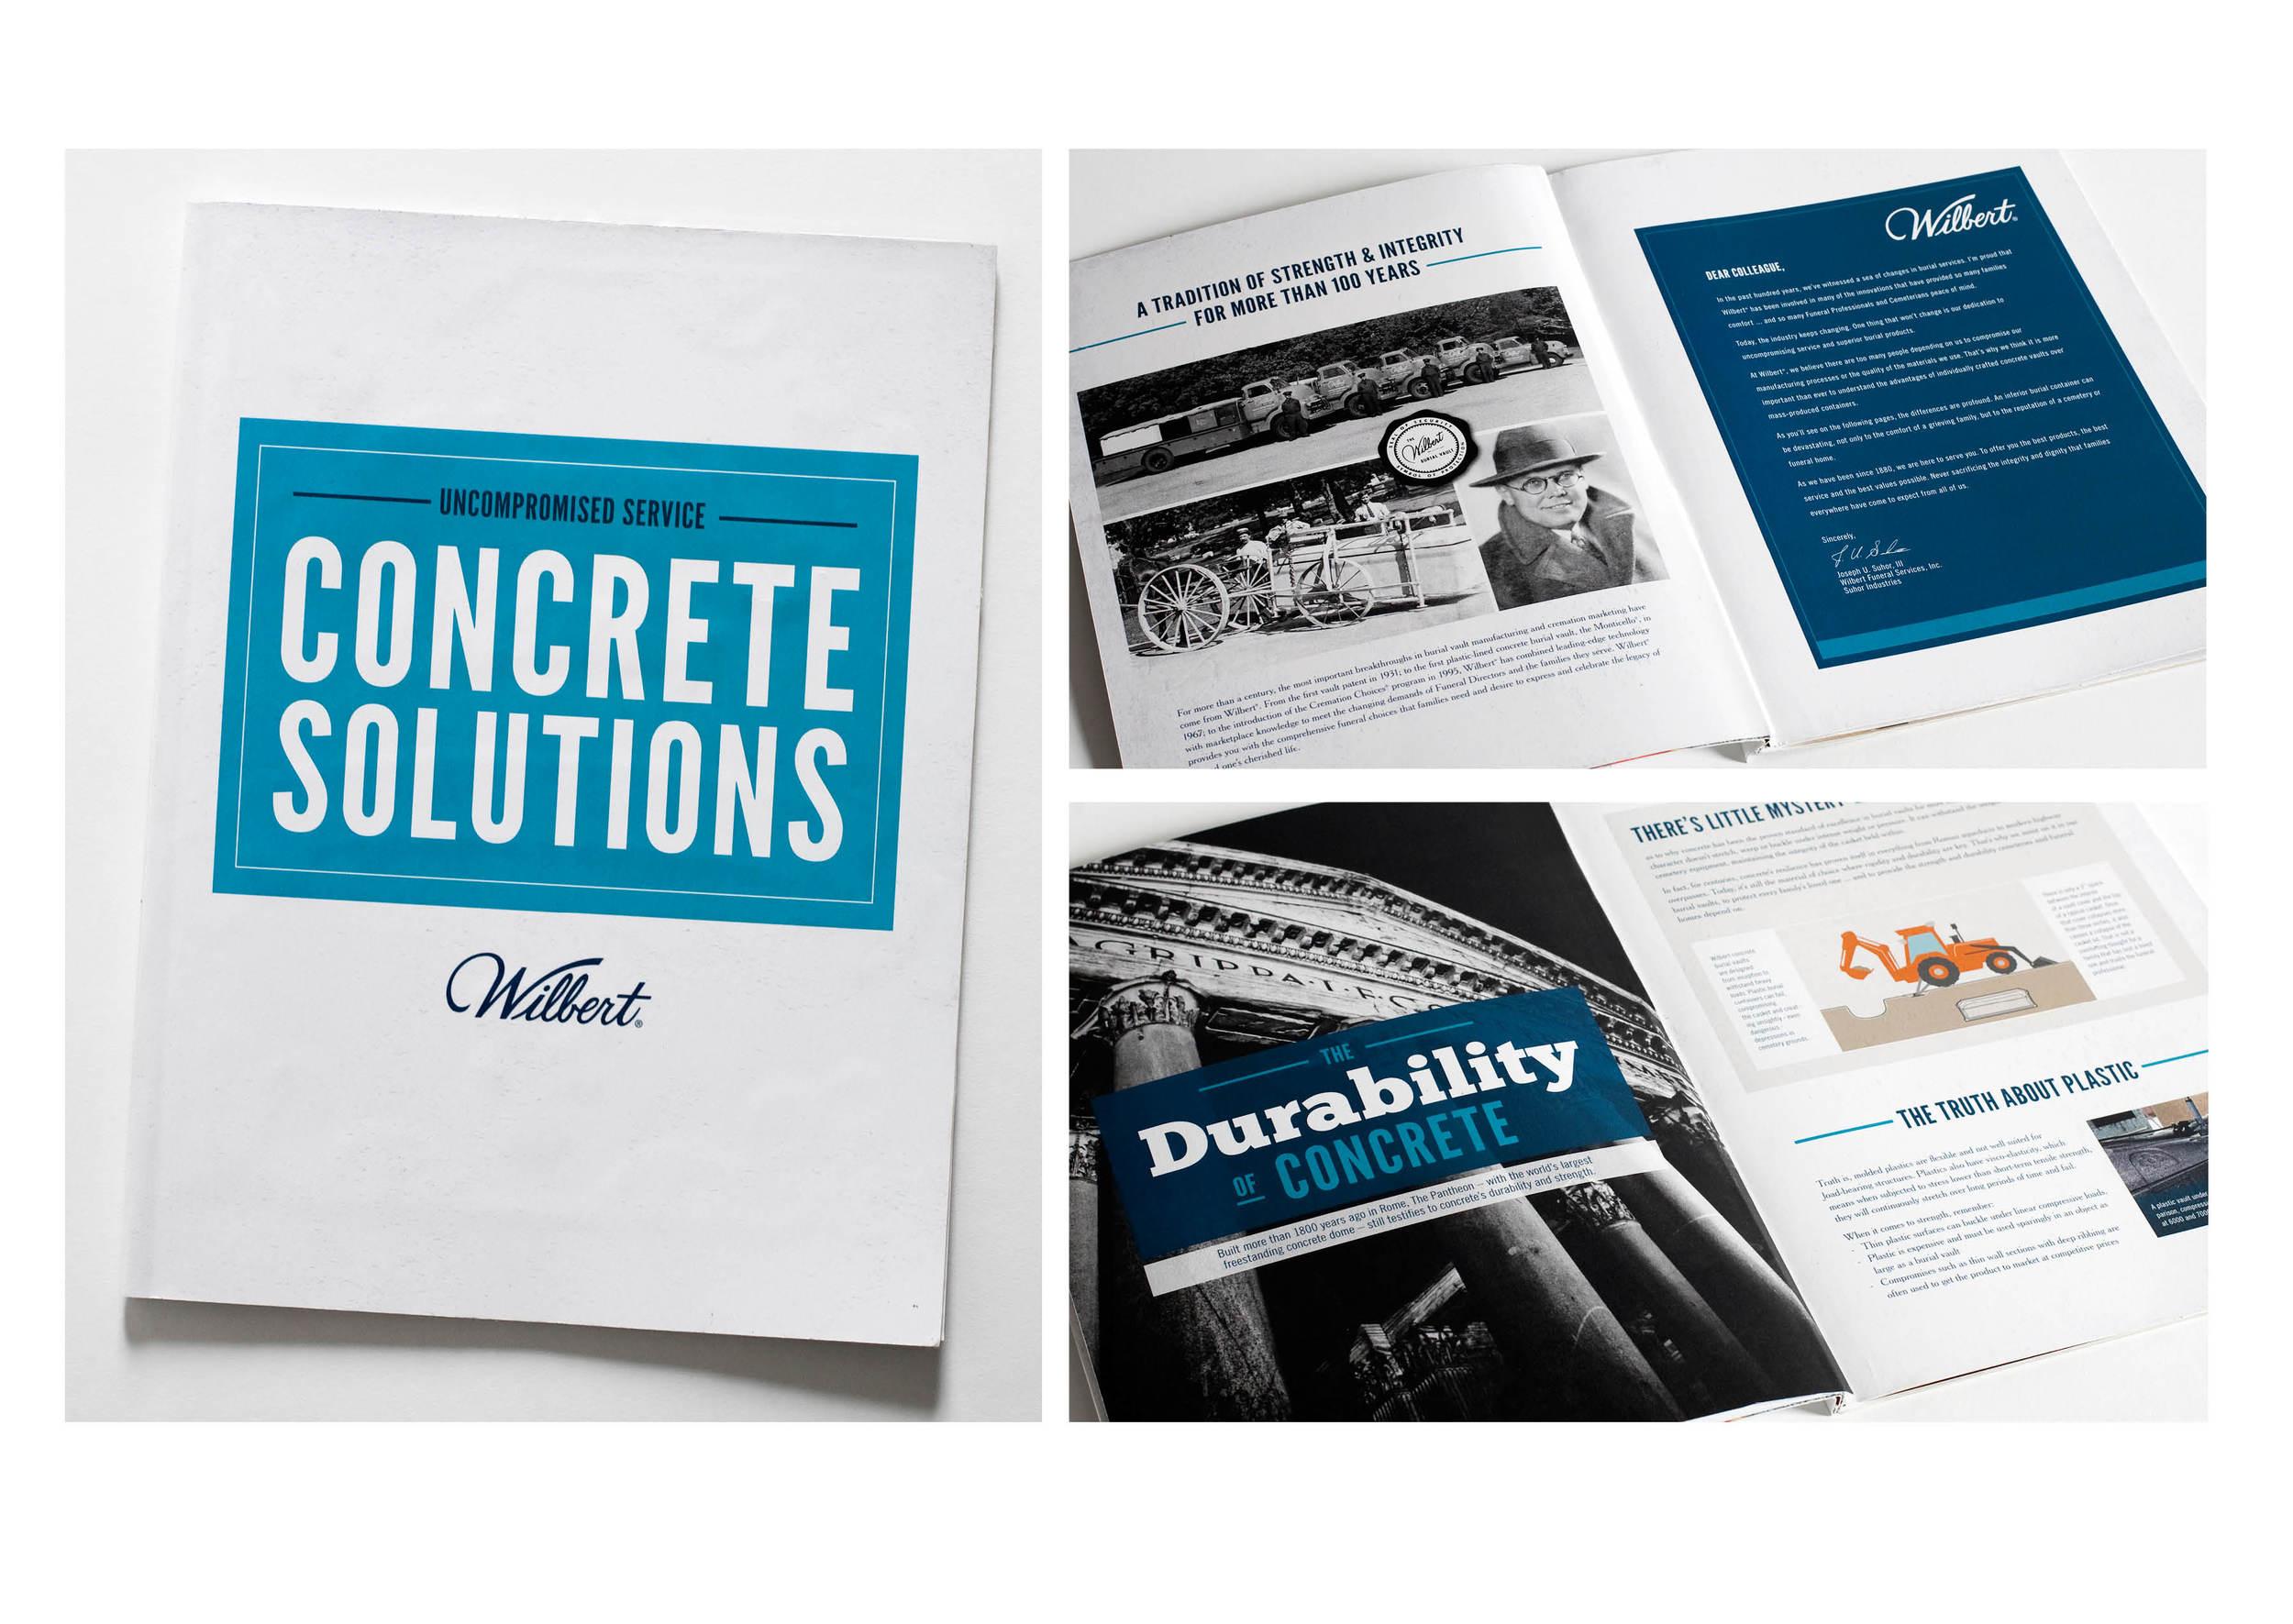 Wilbert | Concrete Solutions Brochure | tashvock.com